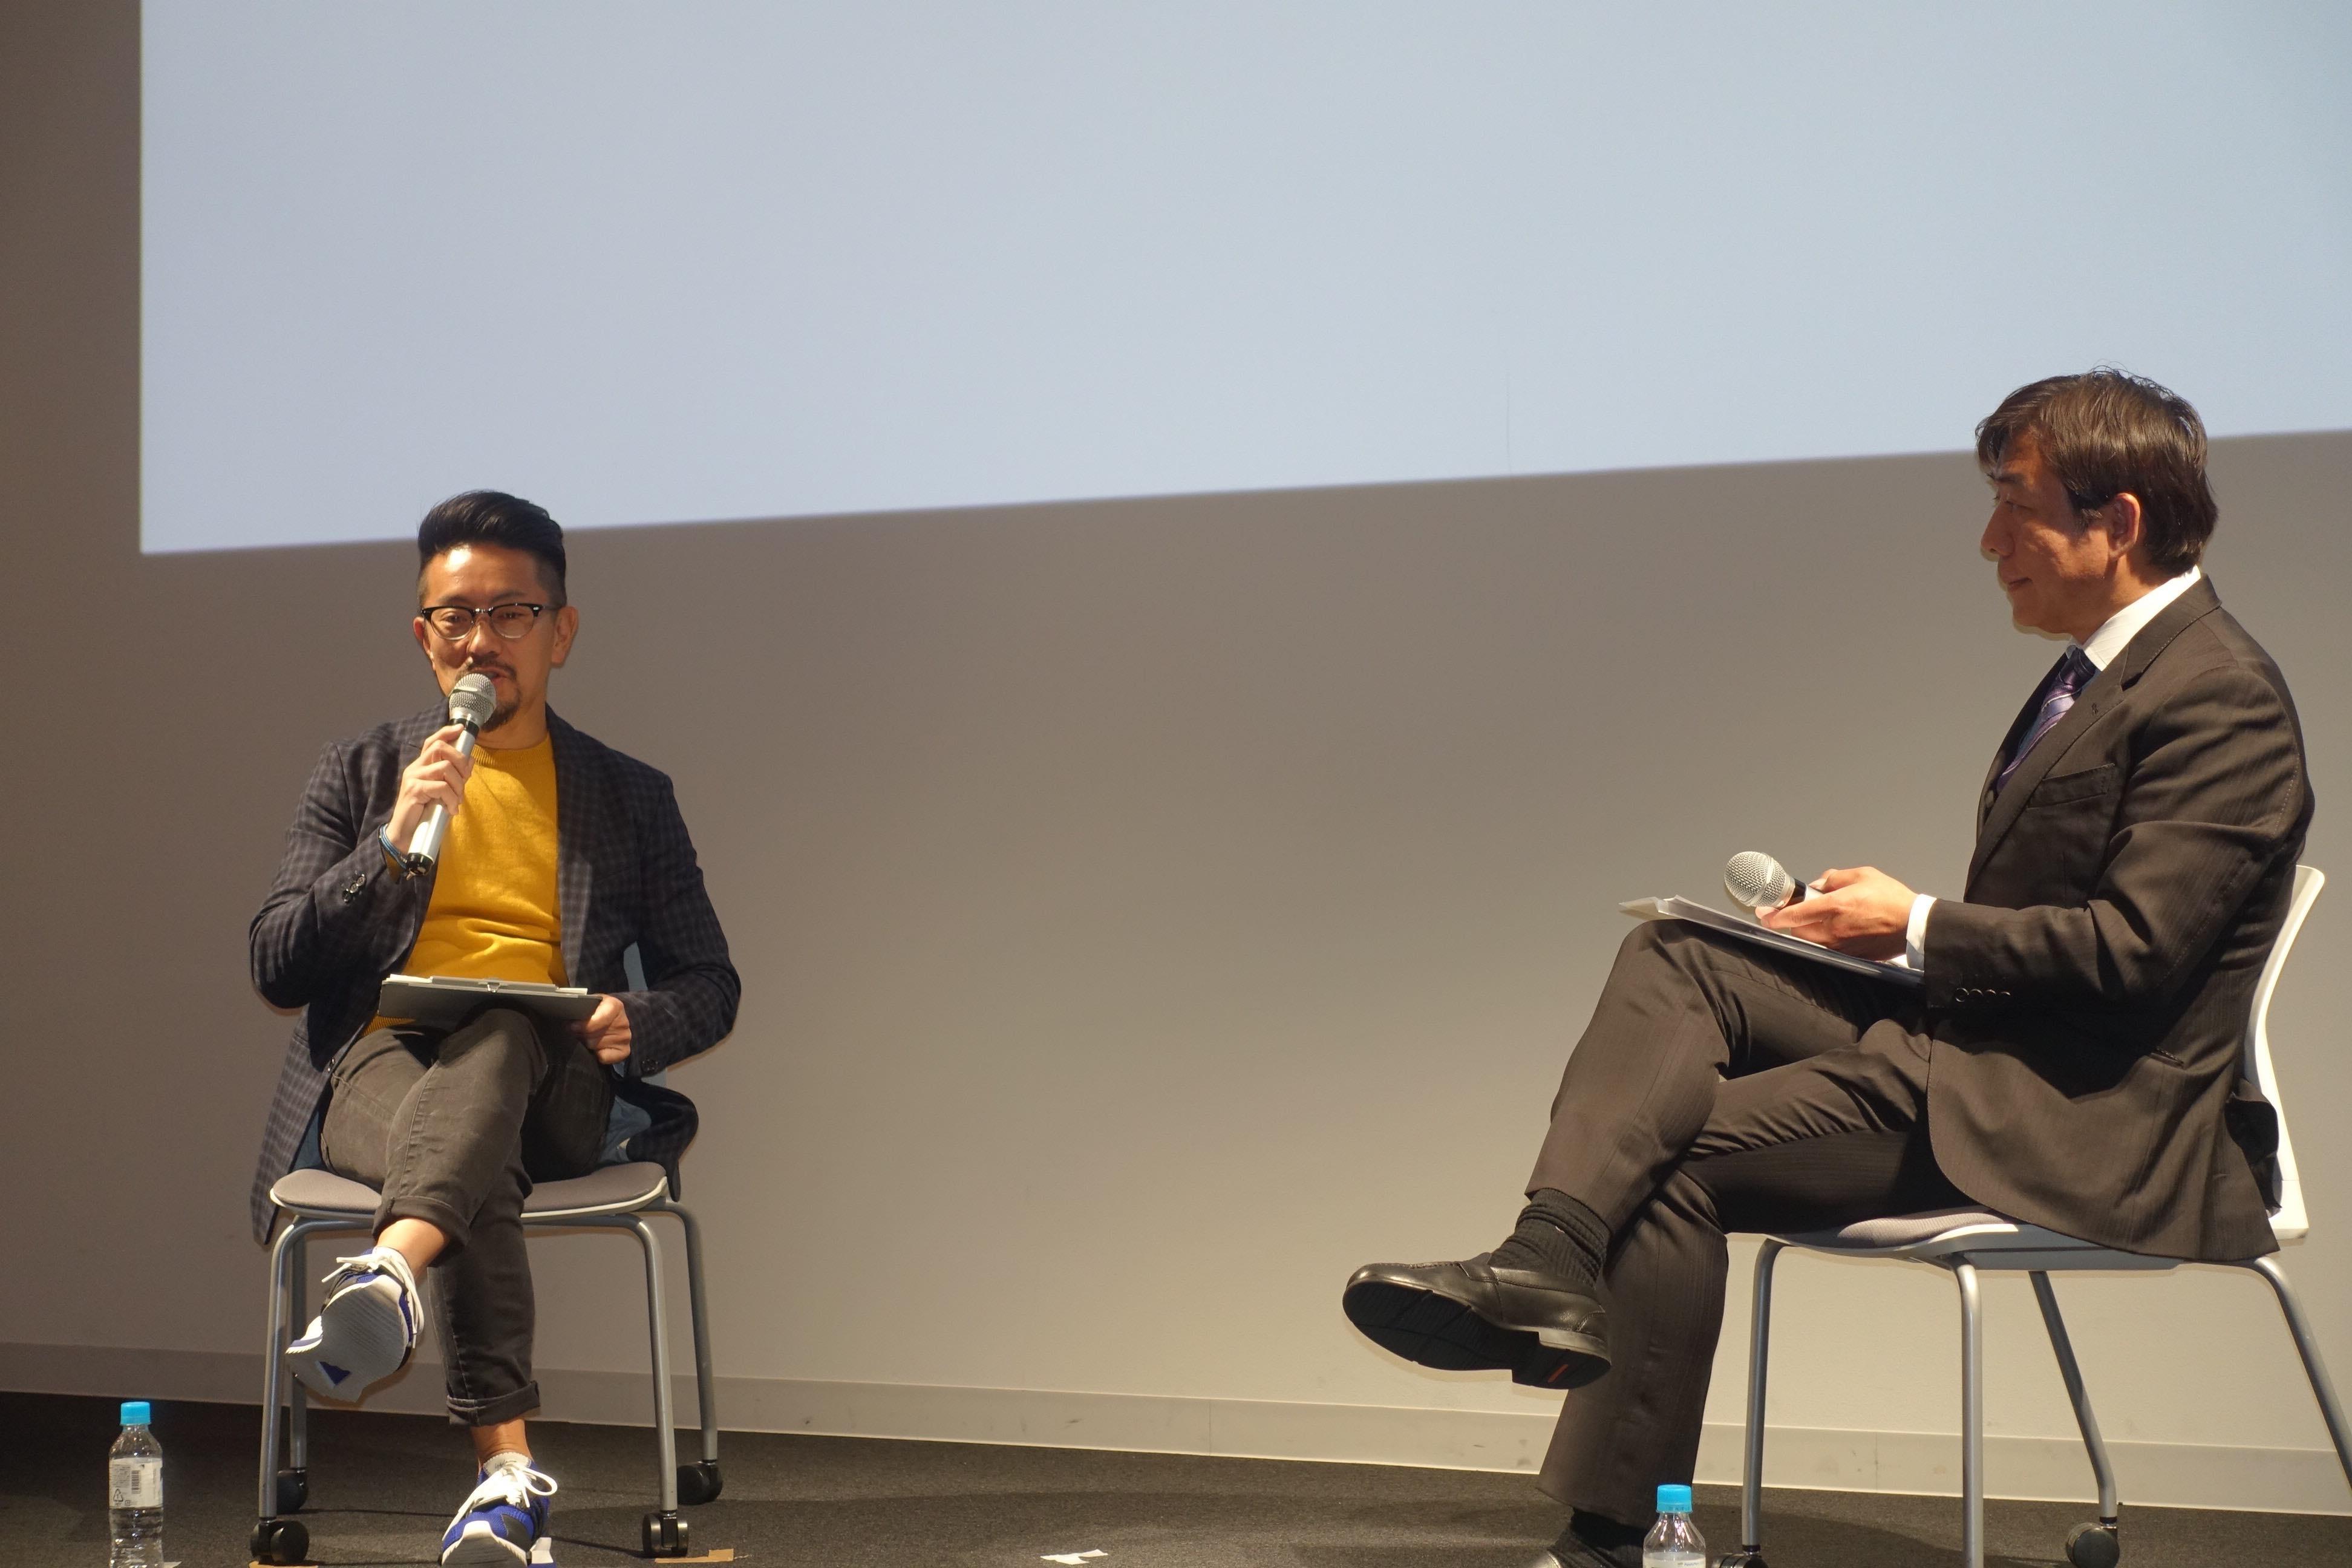 Shibata (left), Tsurumoto (right)